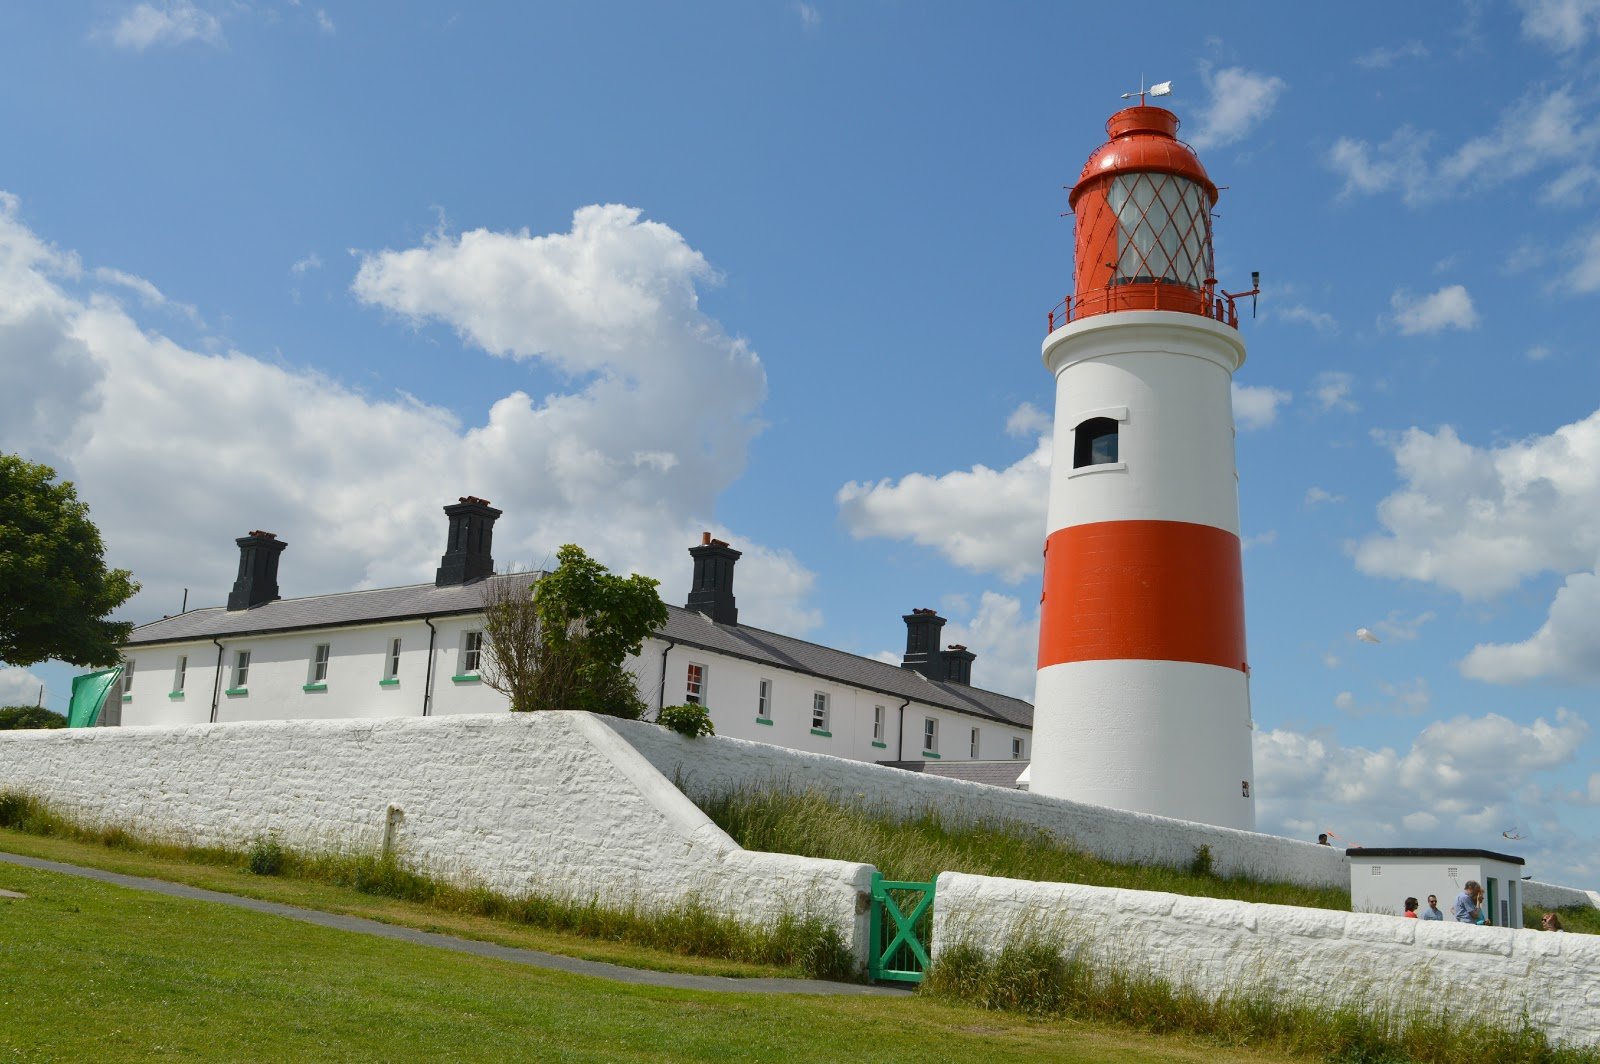 Best Walks in the North East - Sunderland Coastal Path